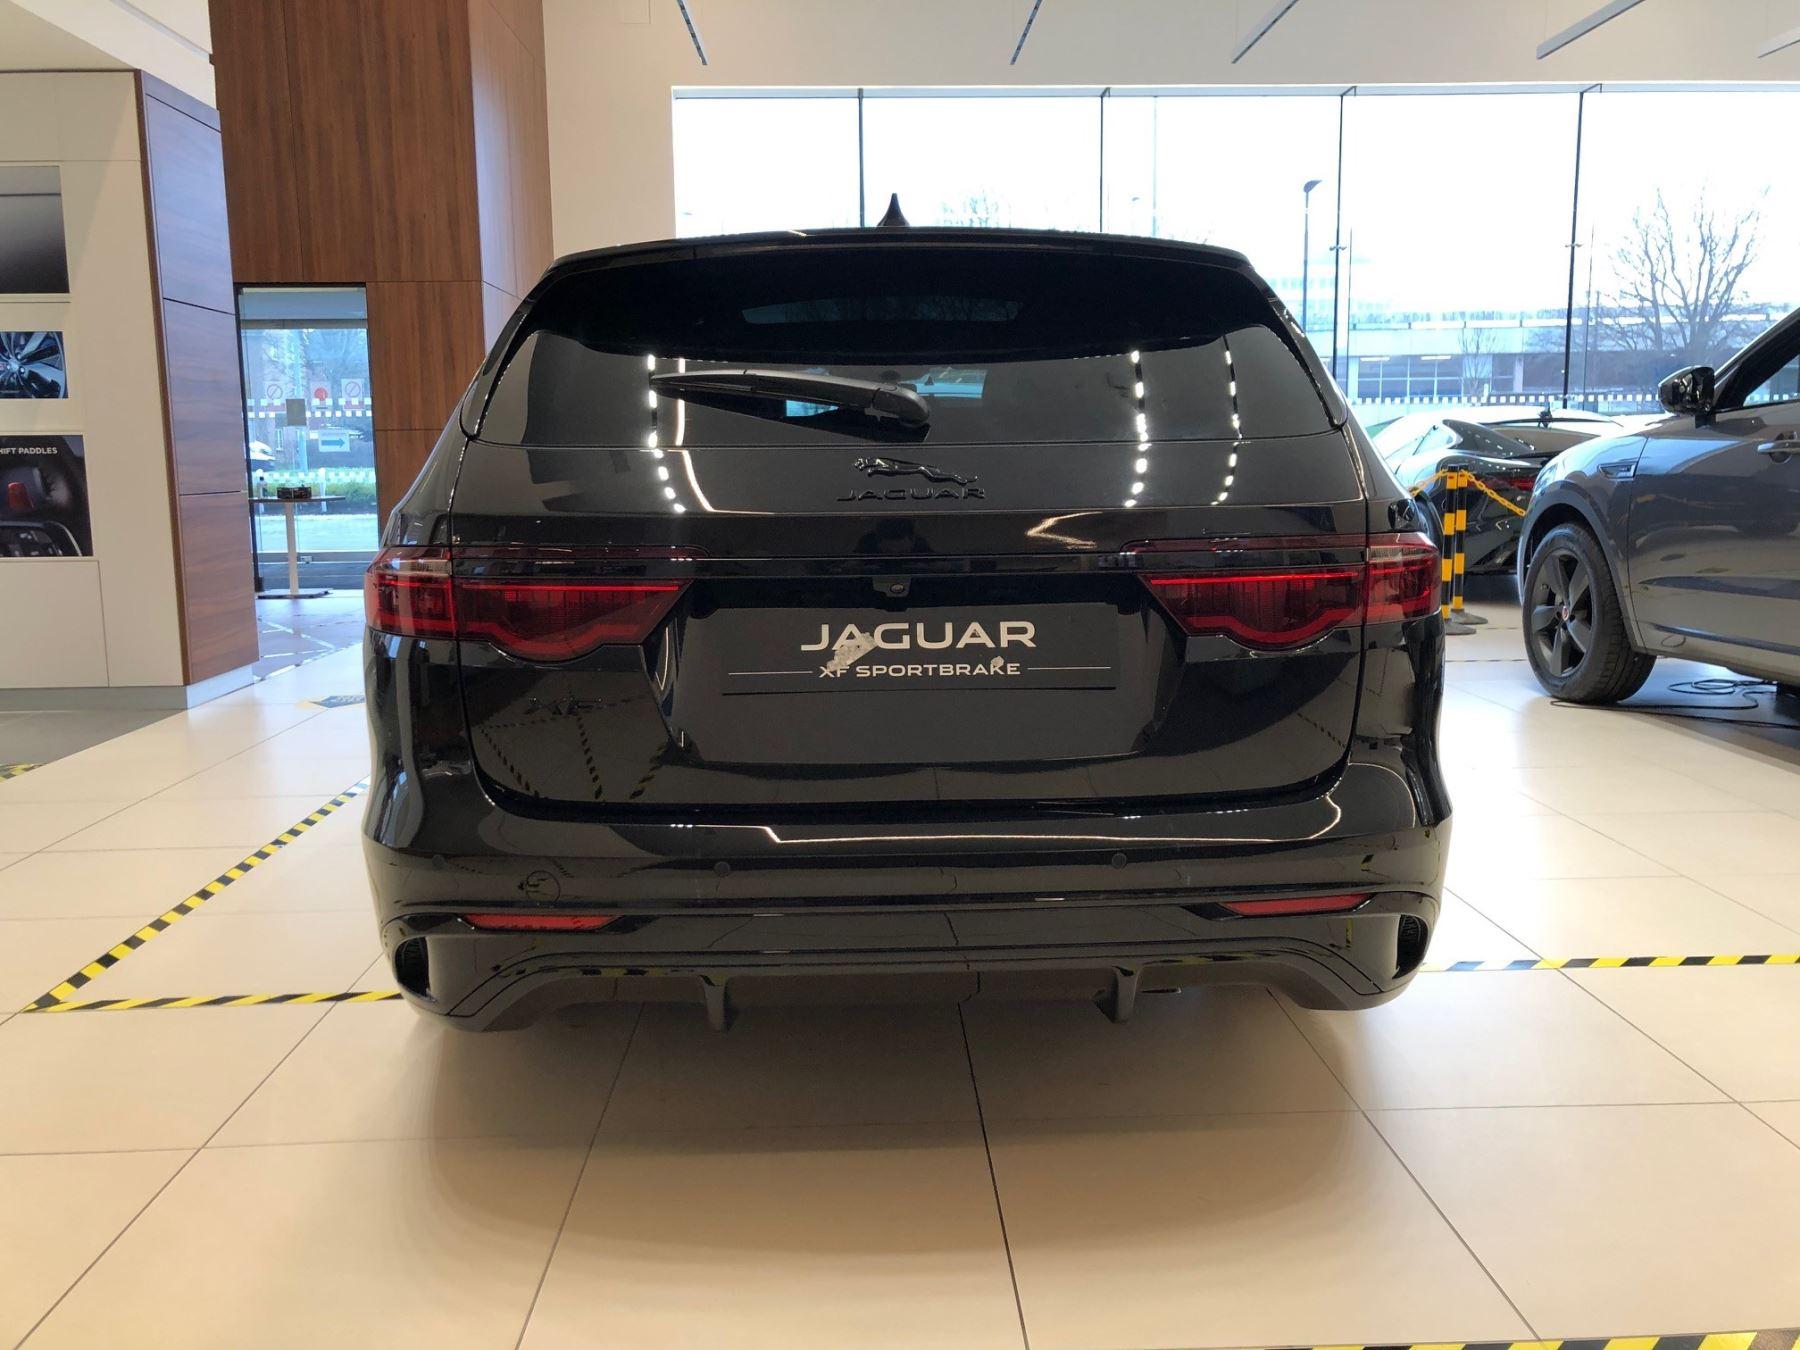 Jaguar XF Sportbrake 2.0 P250 R-Dynamic SE image 3